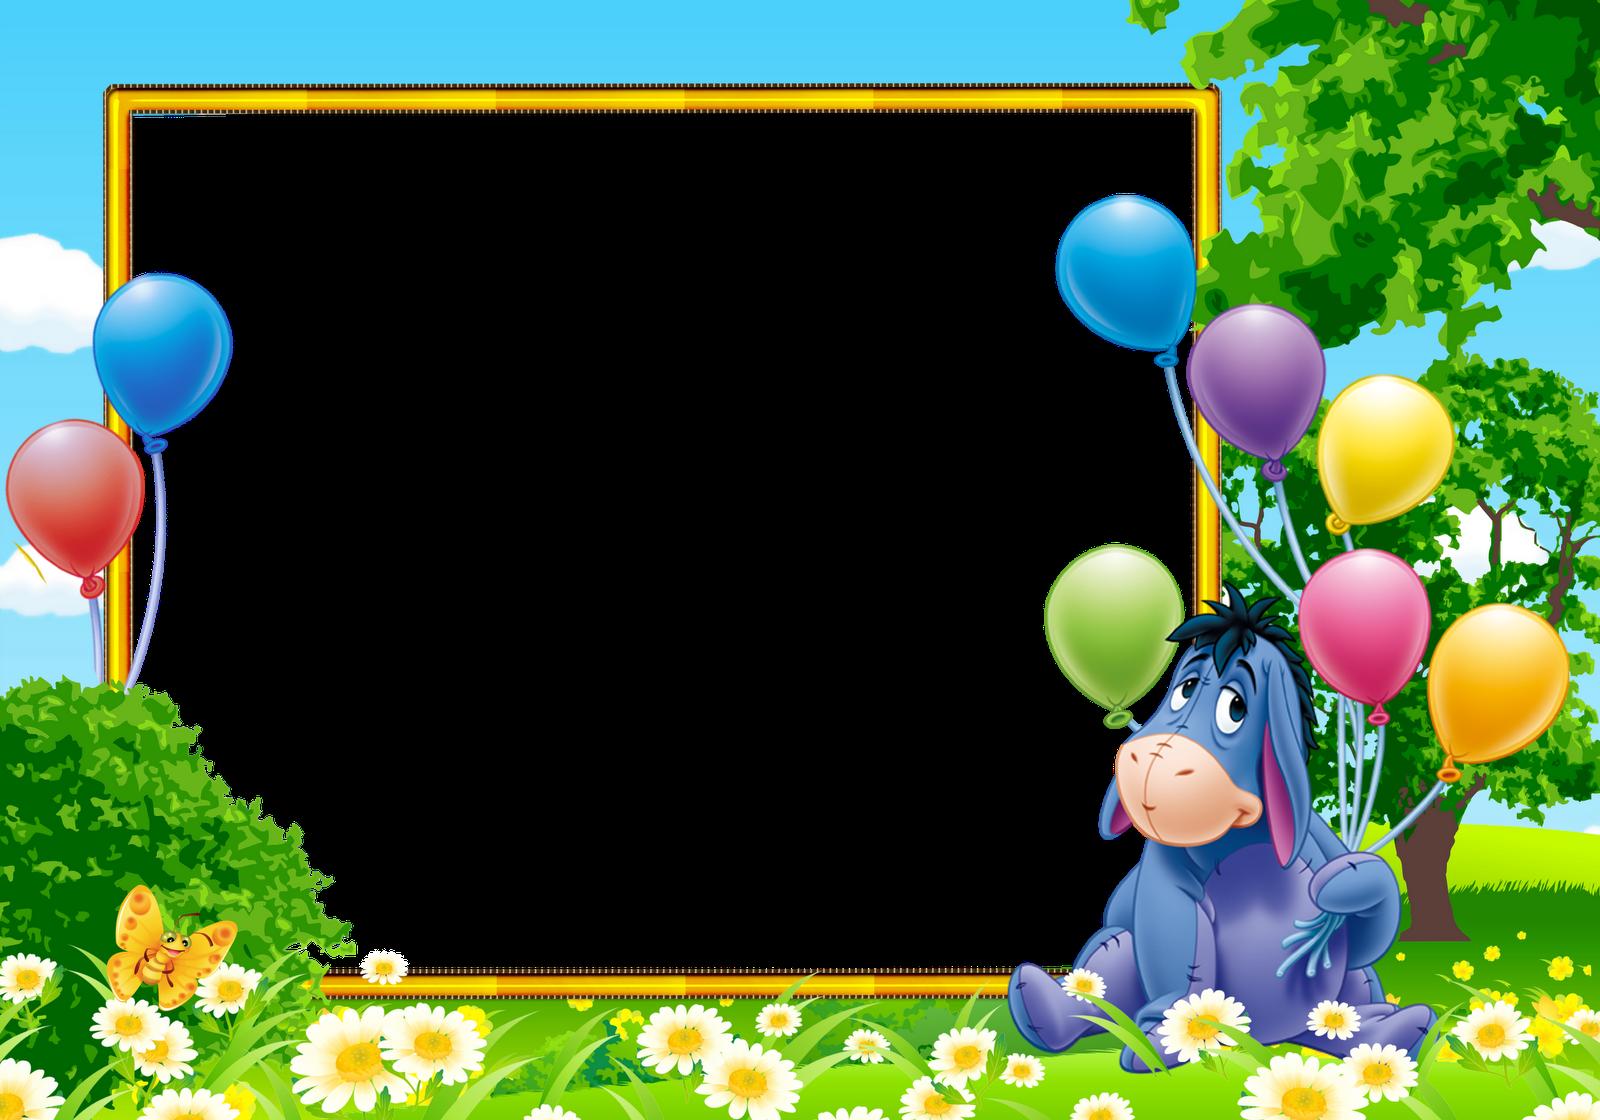 Clipart balloon stall. Eeyore from winnie the